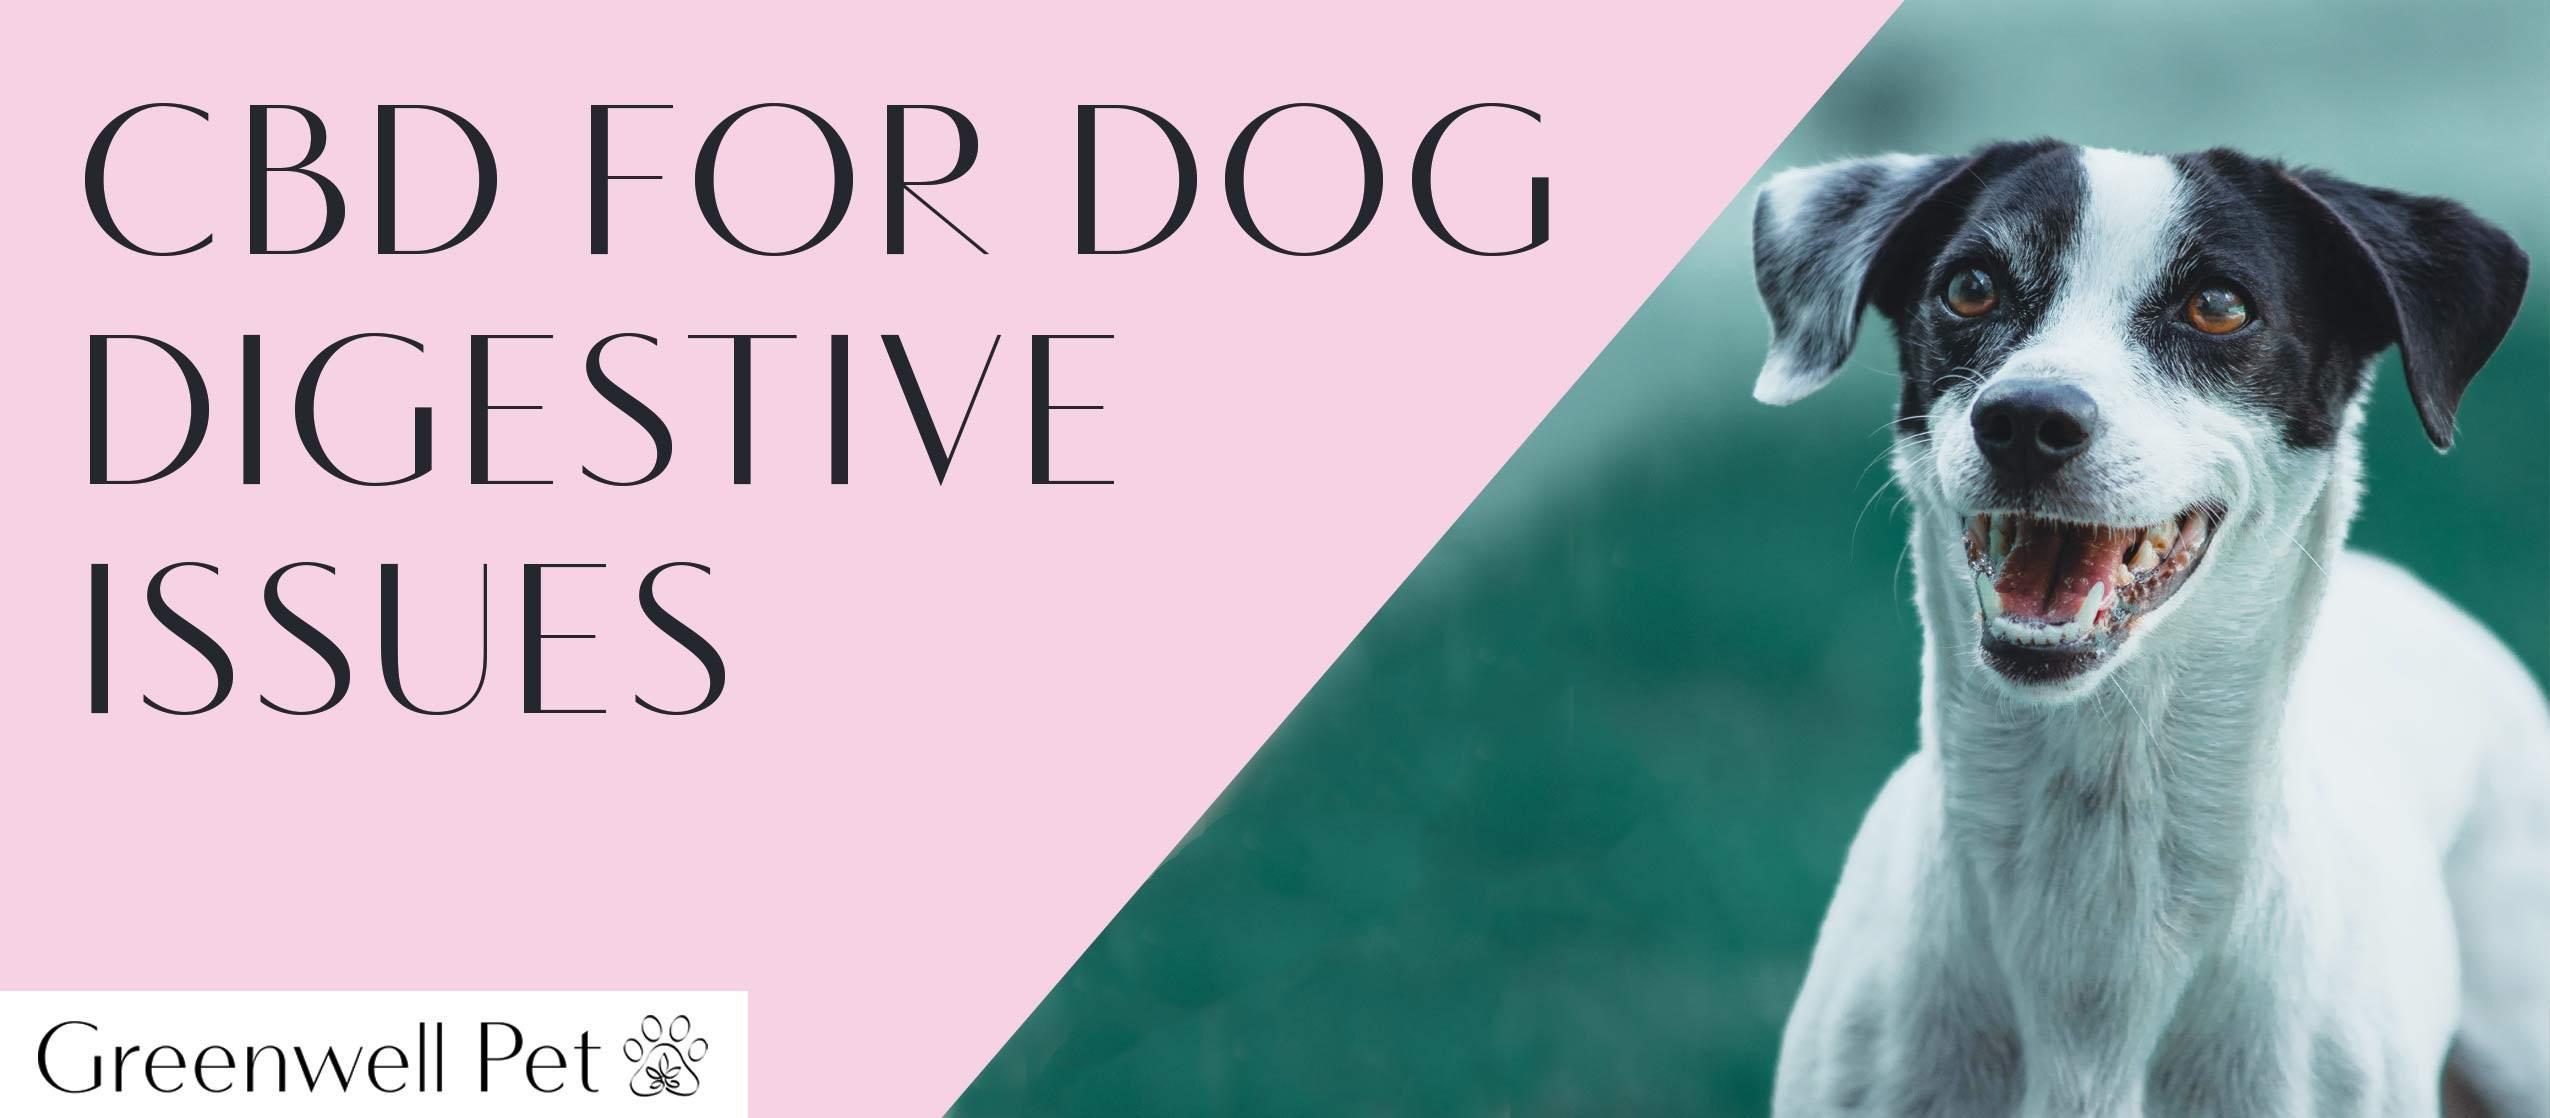 cbd for dog digestion